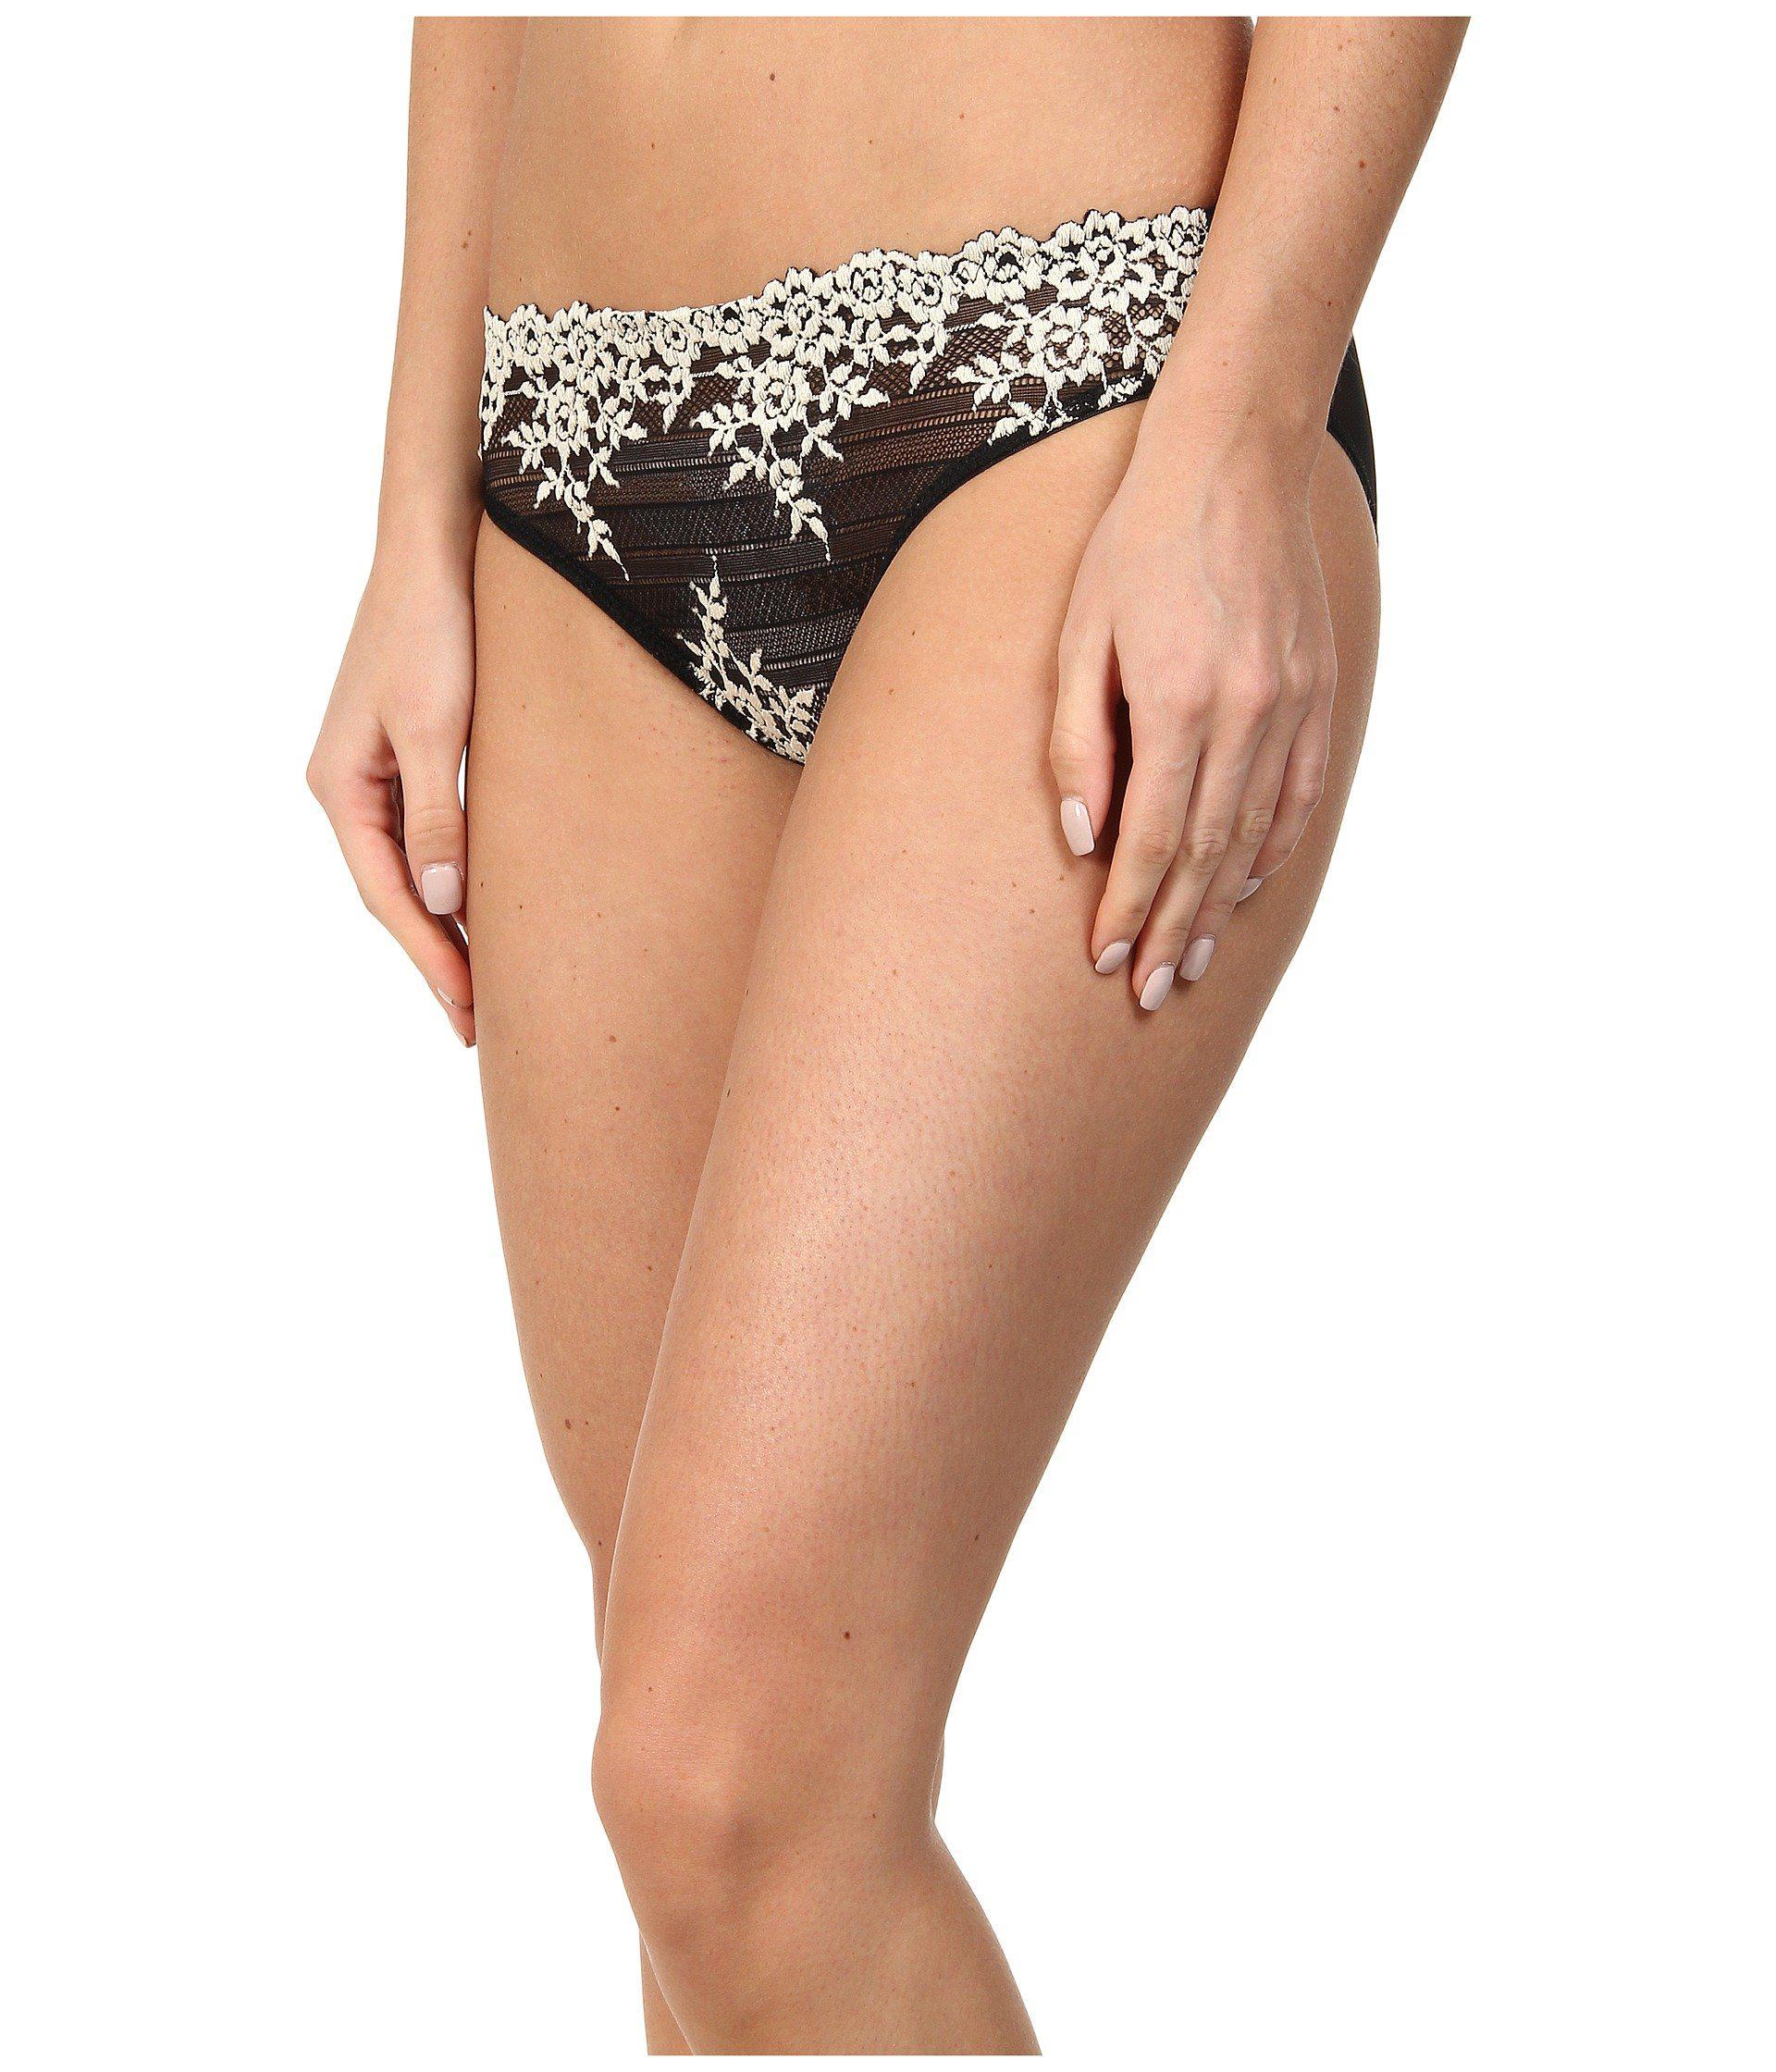 453f4548125a2 Lyst - Wacoal Embrace Lace Bikini (natural Nude ivory) Women s ...